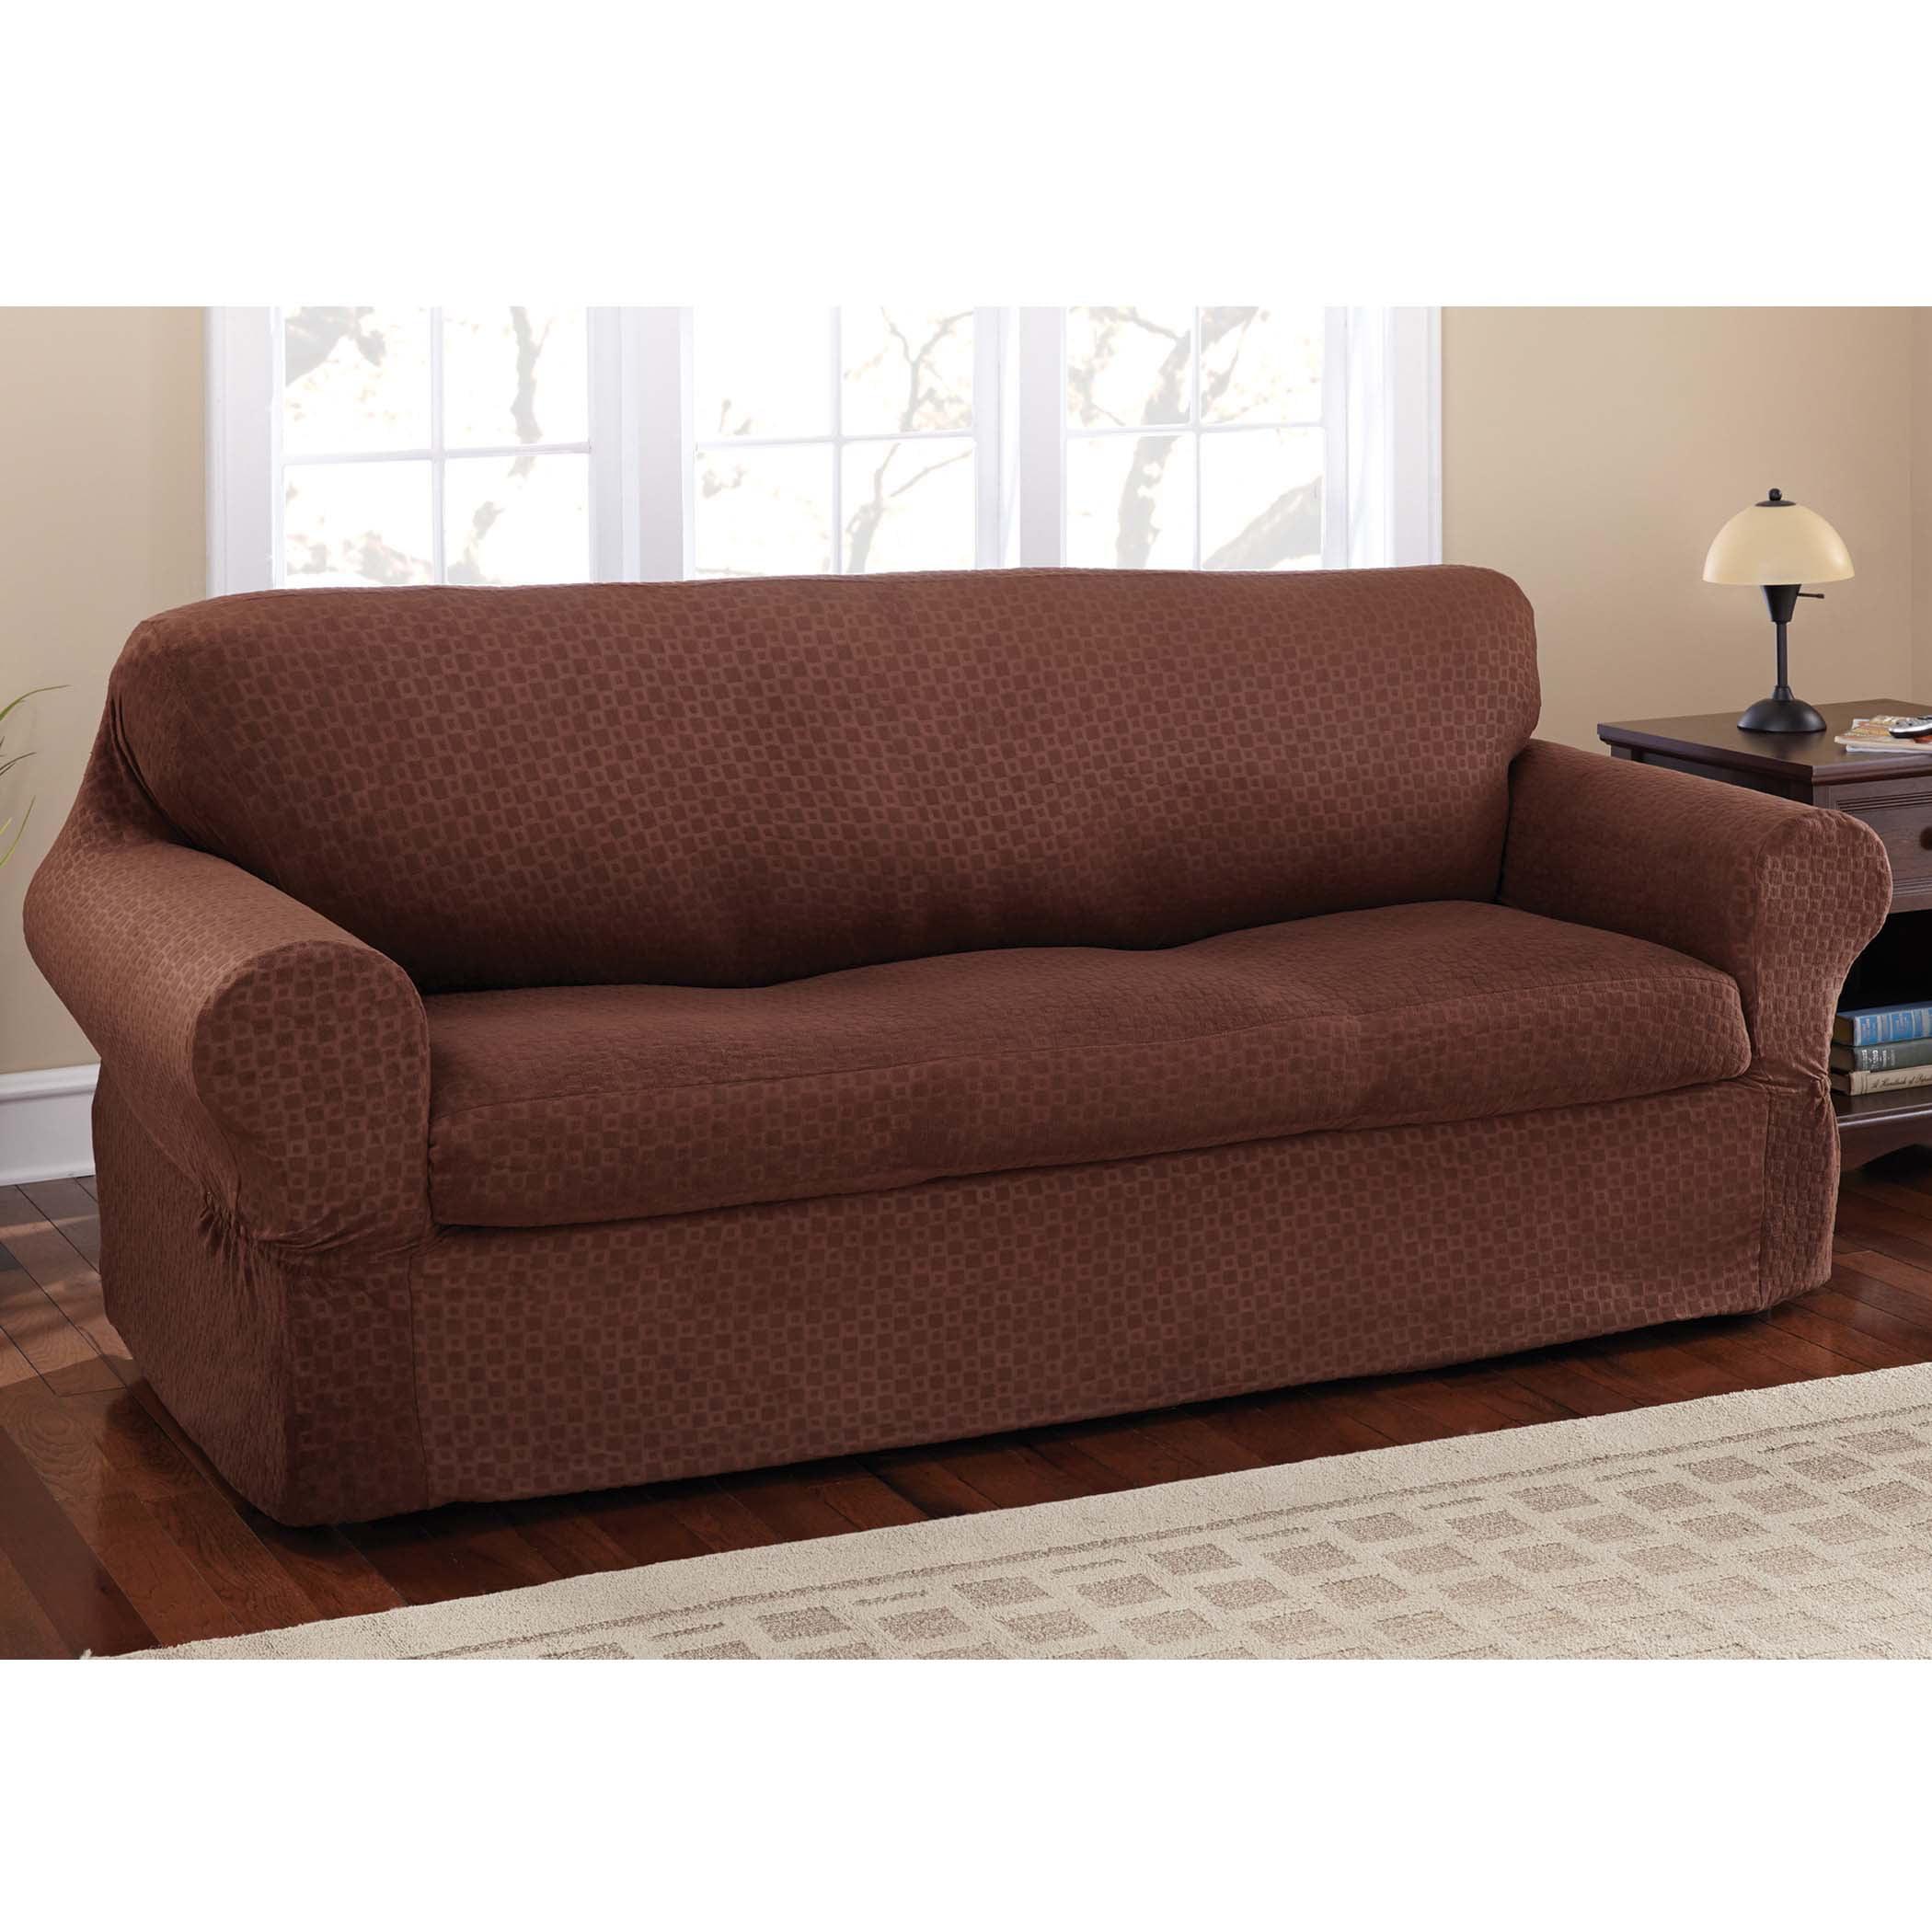 Mainstays Conrad 2-Piece Sofa Slipcover by Maytex Mills